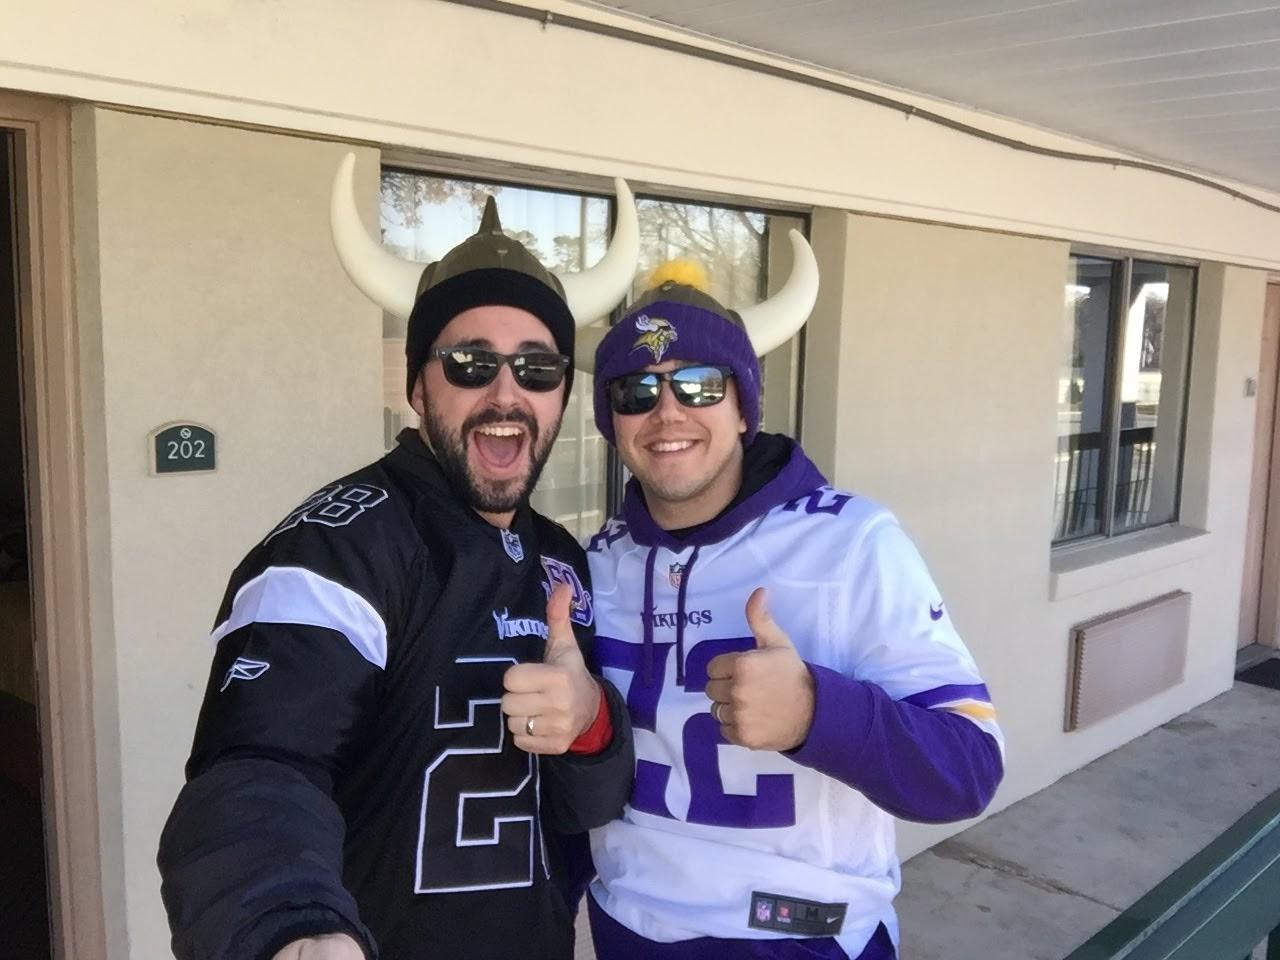 Vikings vs. Panthers in Charlotte